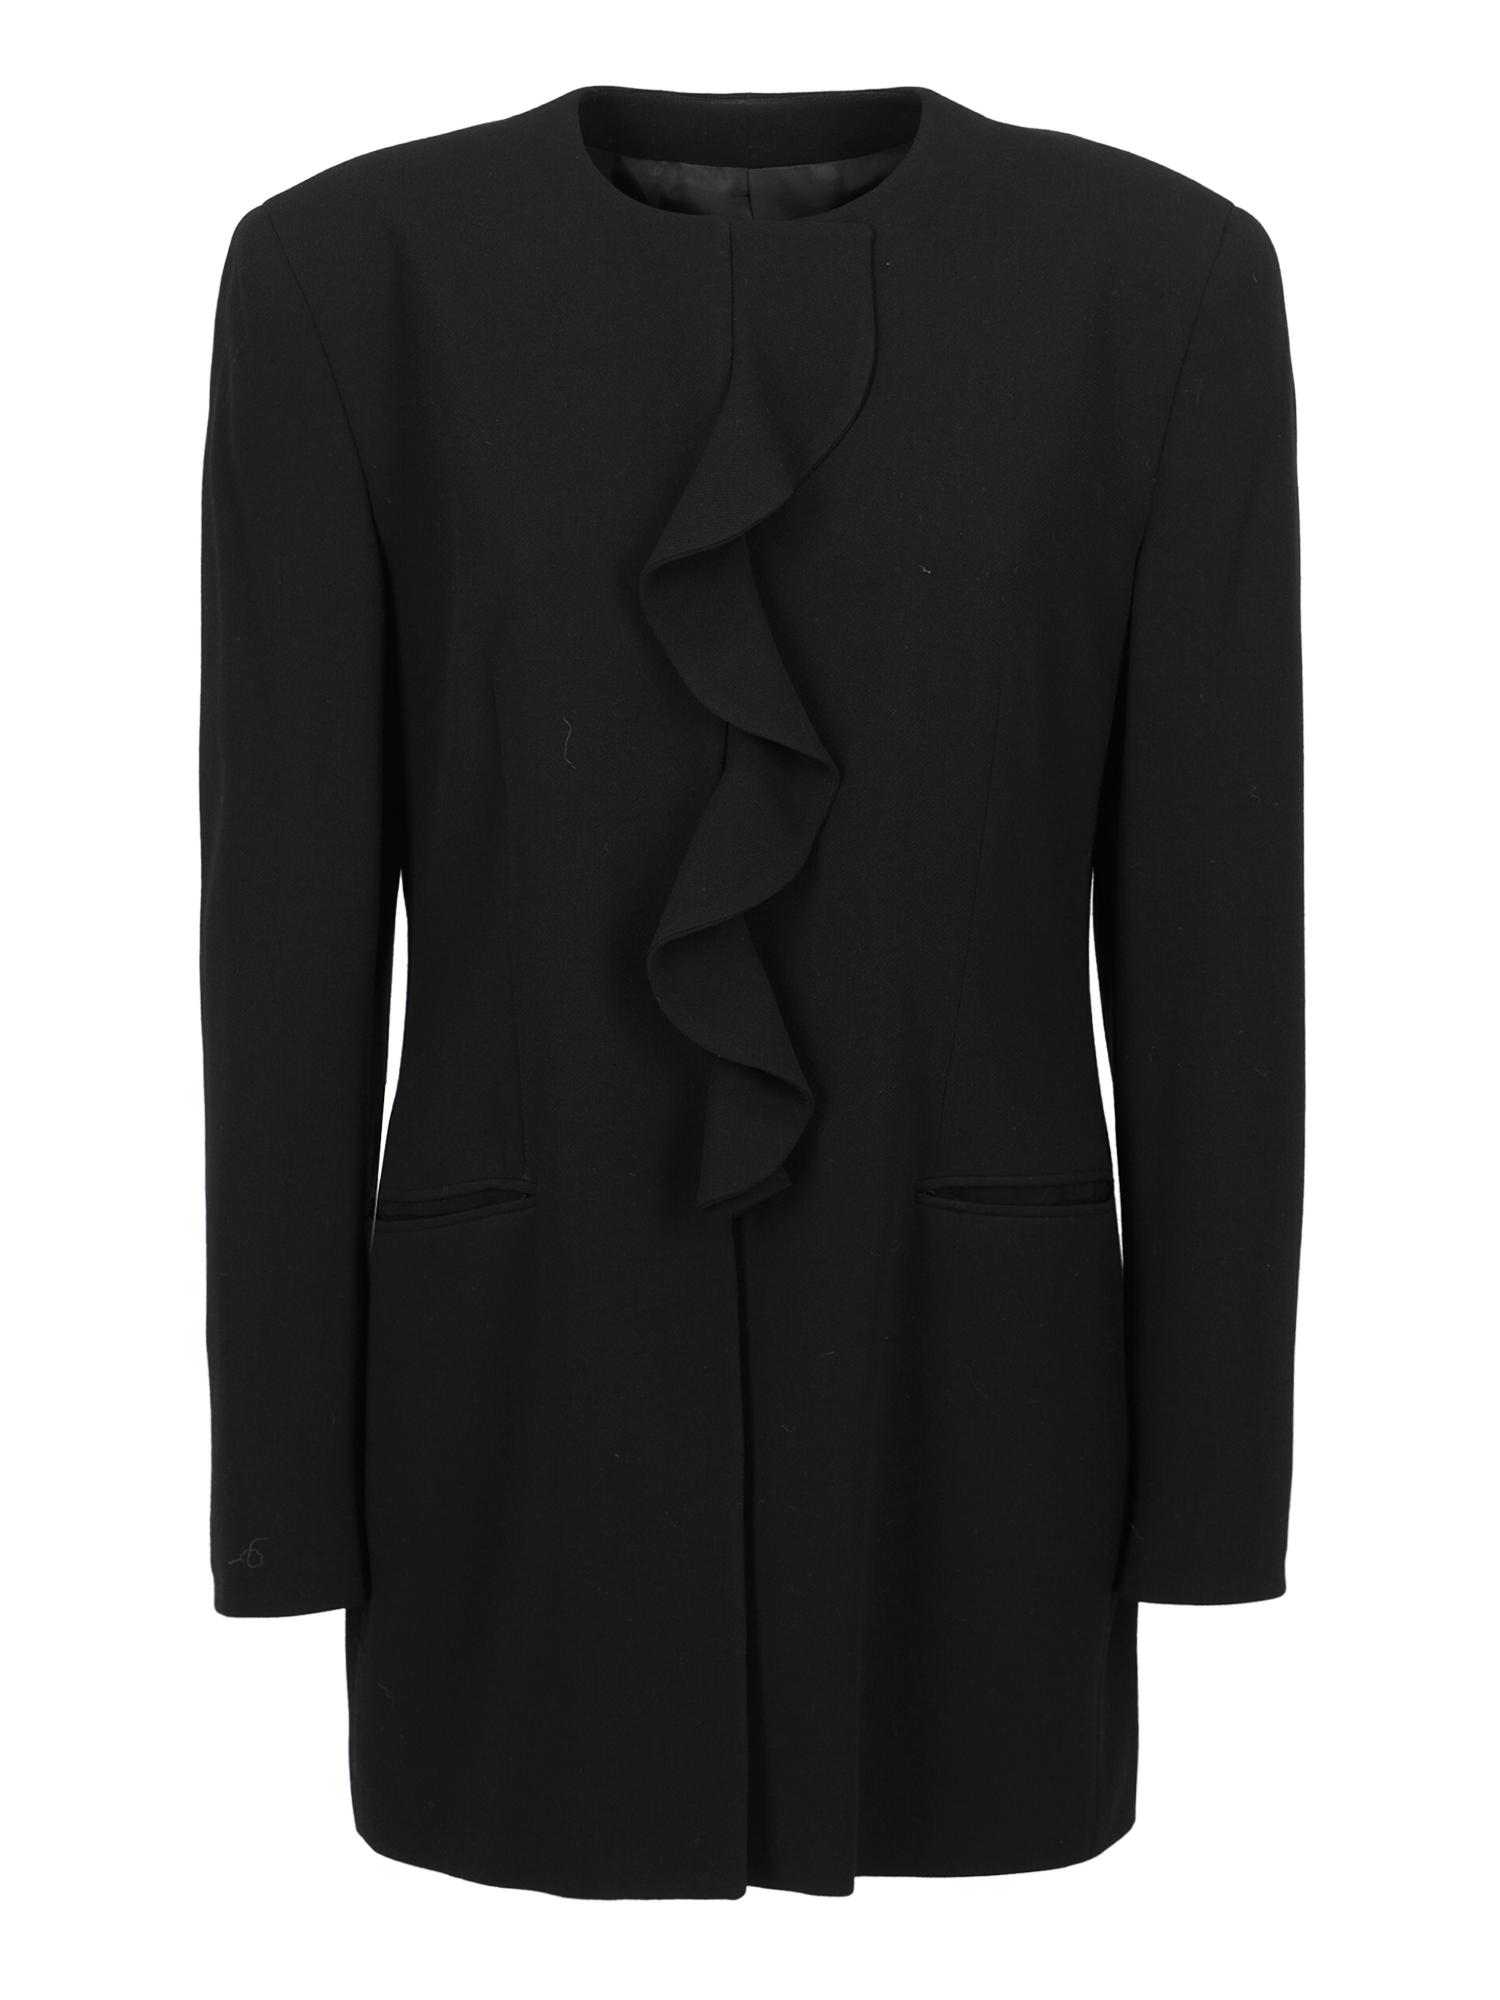 Pre-owned Giorgio Armani Clothing In Black